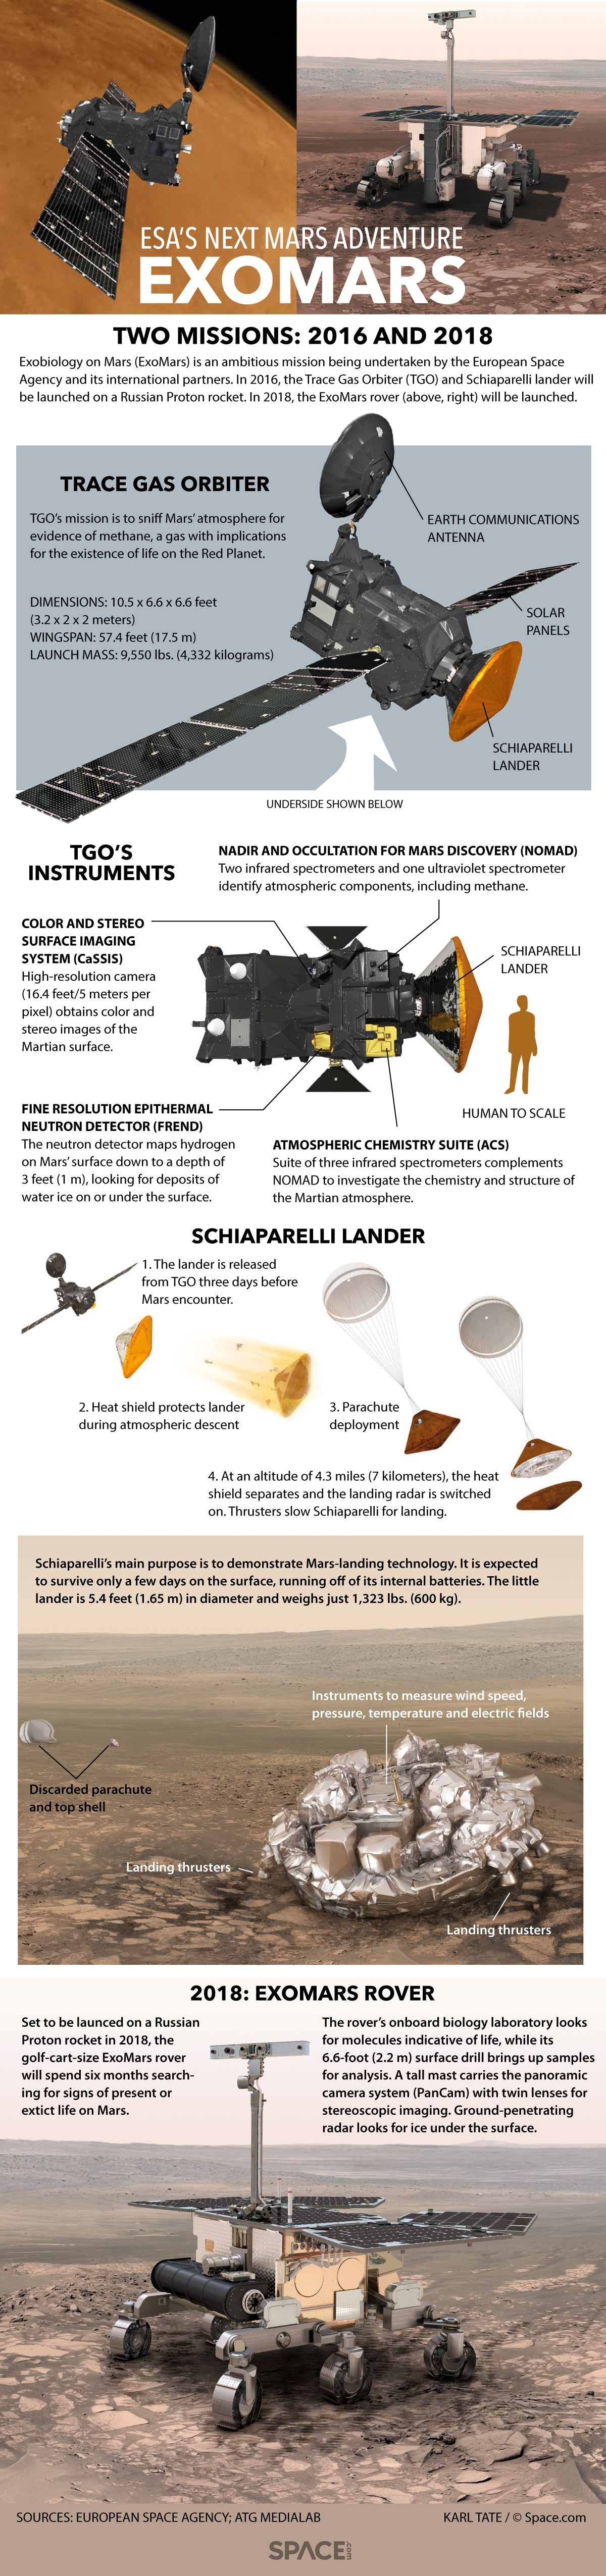 Details of the ExoMars orbiter, lander and rover.